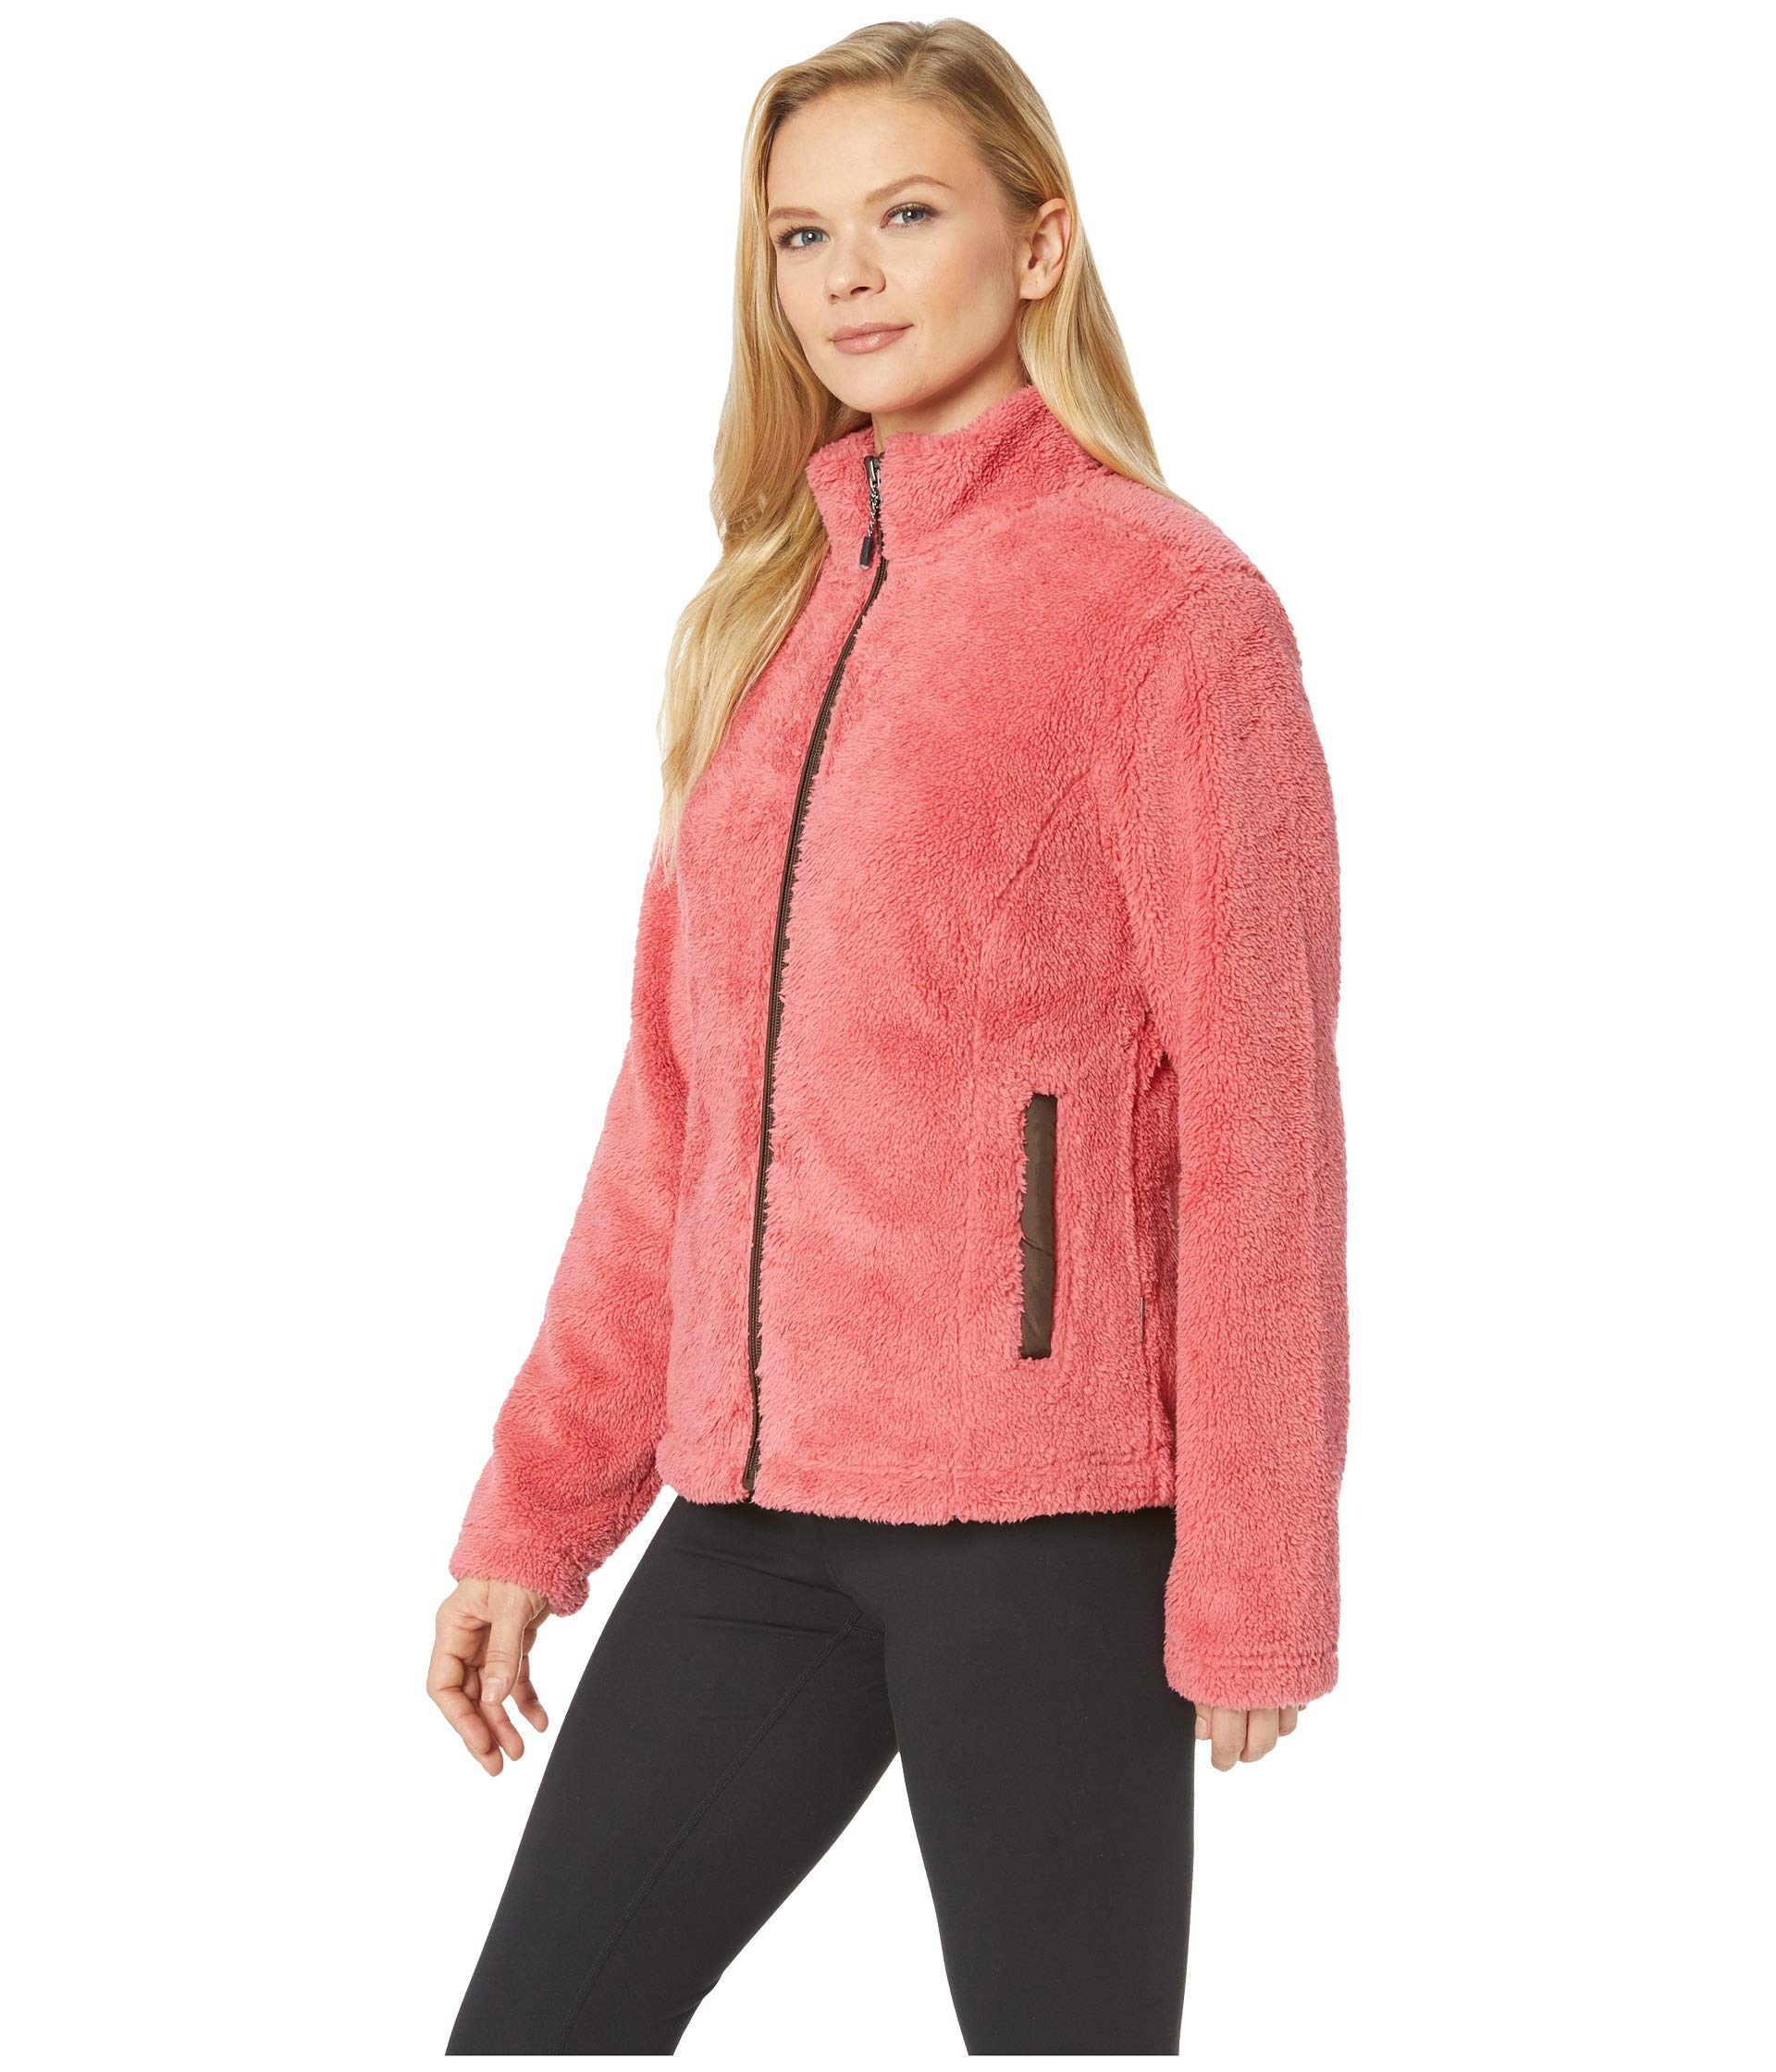 Berry Sierra Bully White Zip Jacket Wooly Ii Holly vq0TzxZ